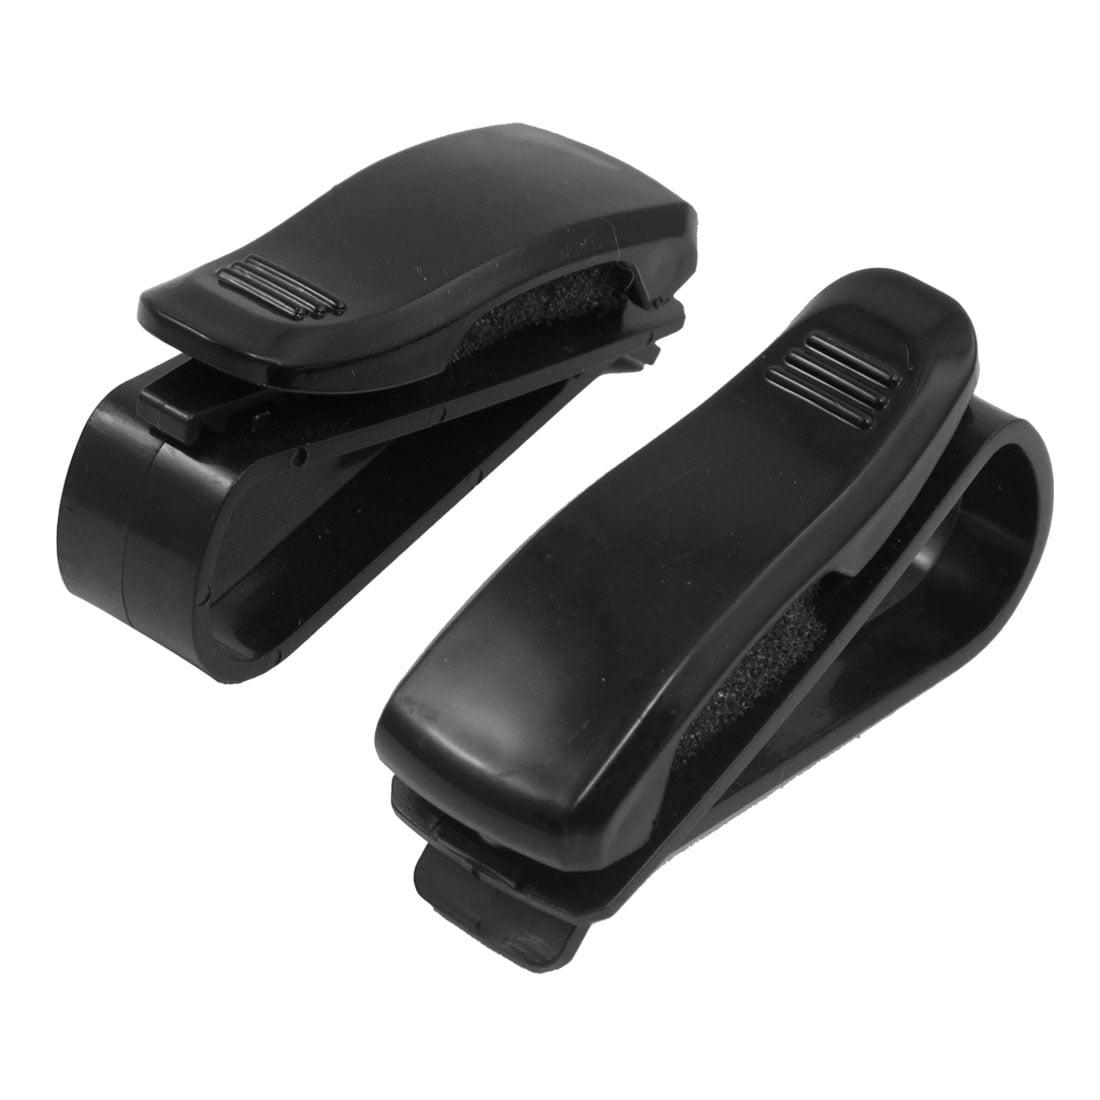 2 x Black Plastic Eyeglasses Card Clip Holder for Auto Cars